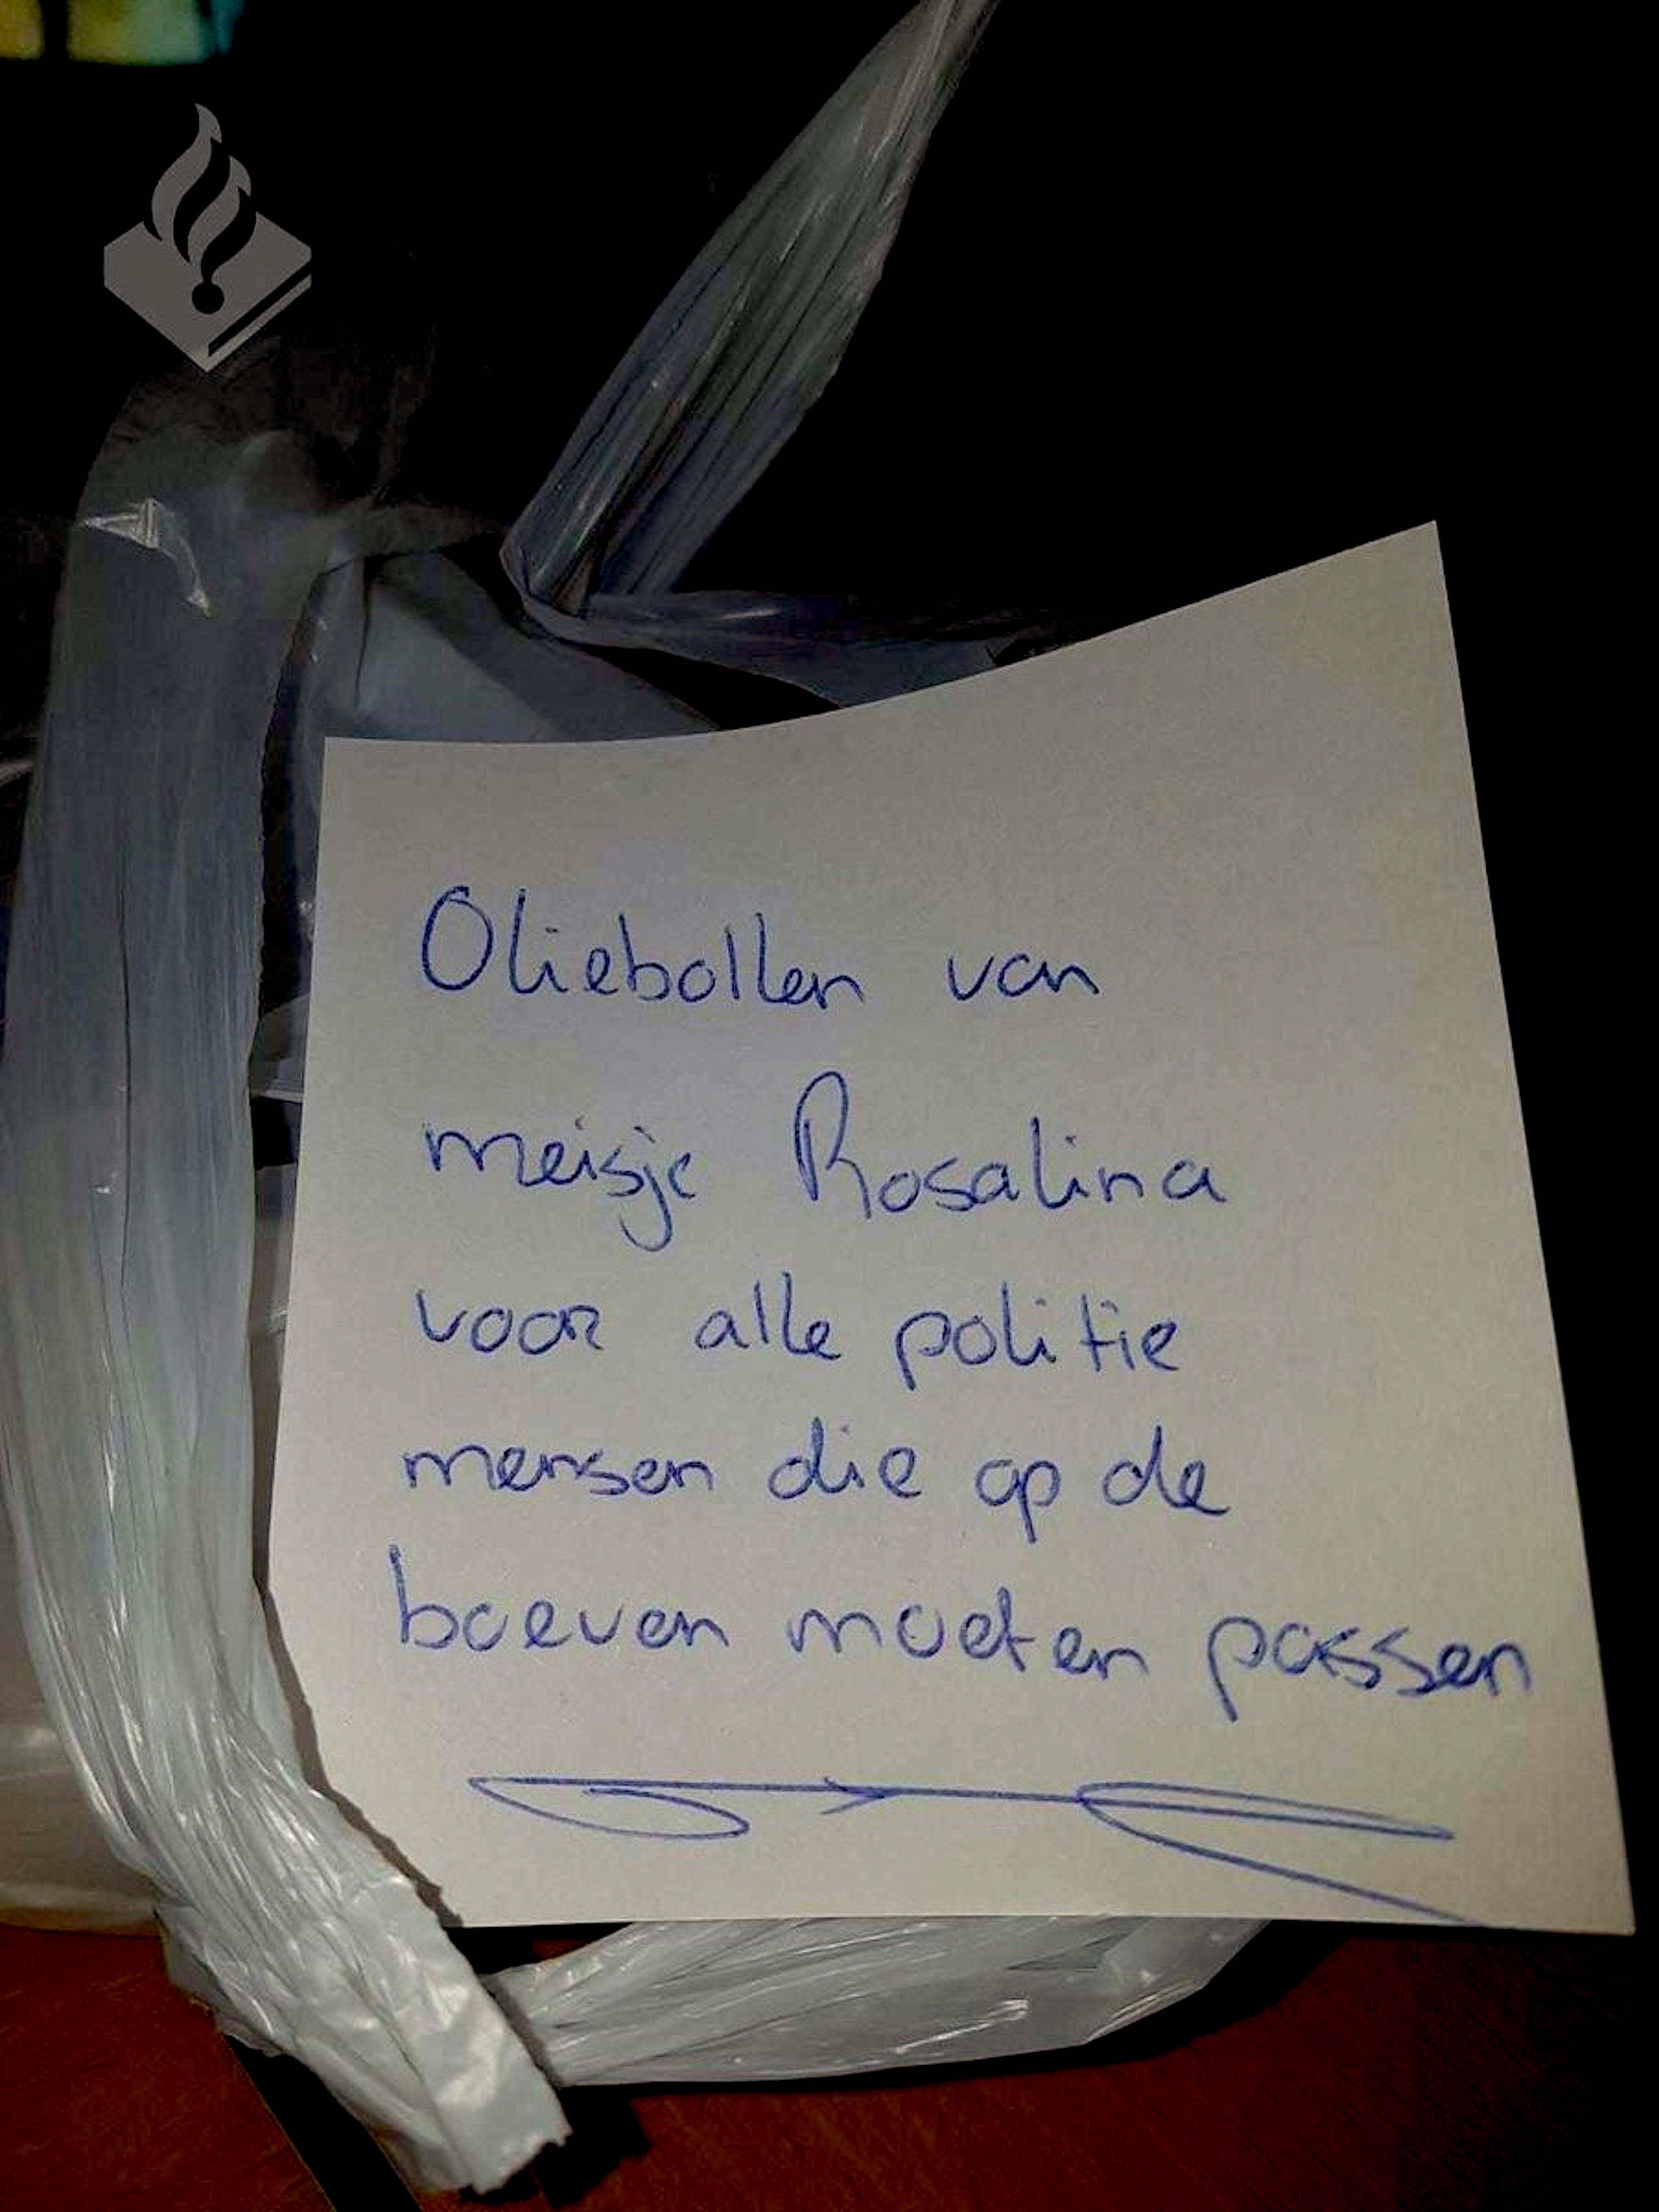 Oliebollen van Rosalina (foto NHD)